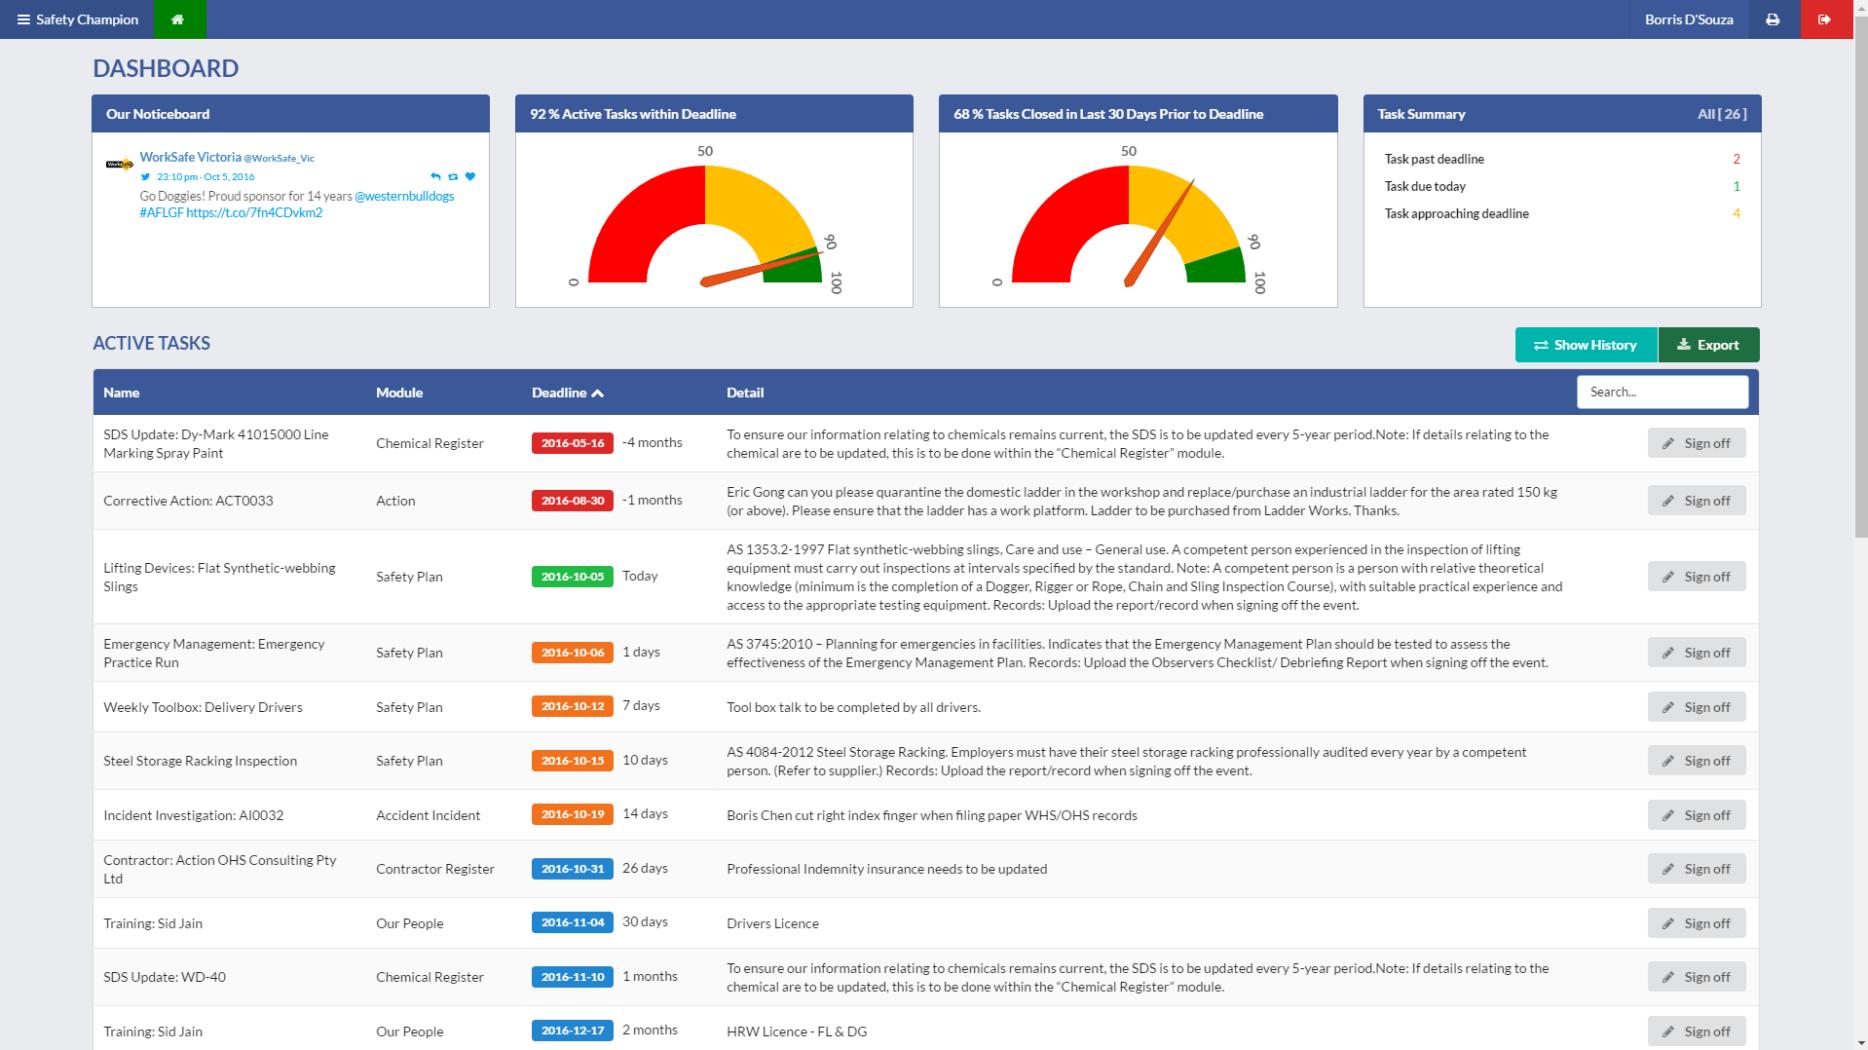 Safety Champion Software Dashboard Image